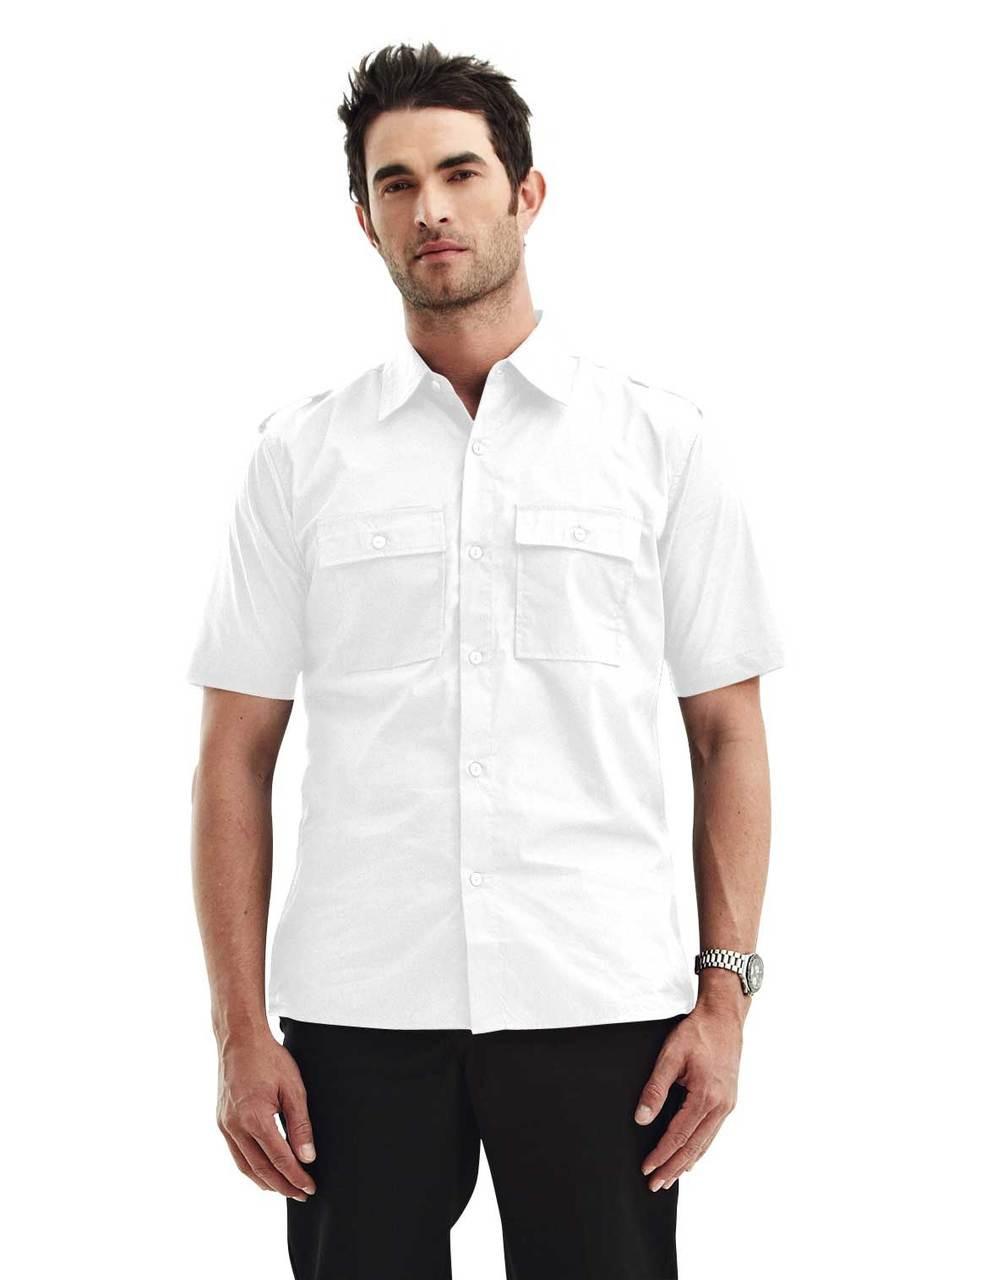 Double Pocket Roll Sleeve Shirt